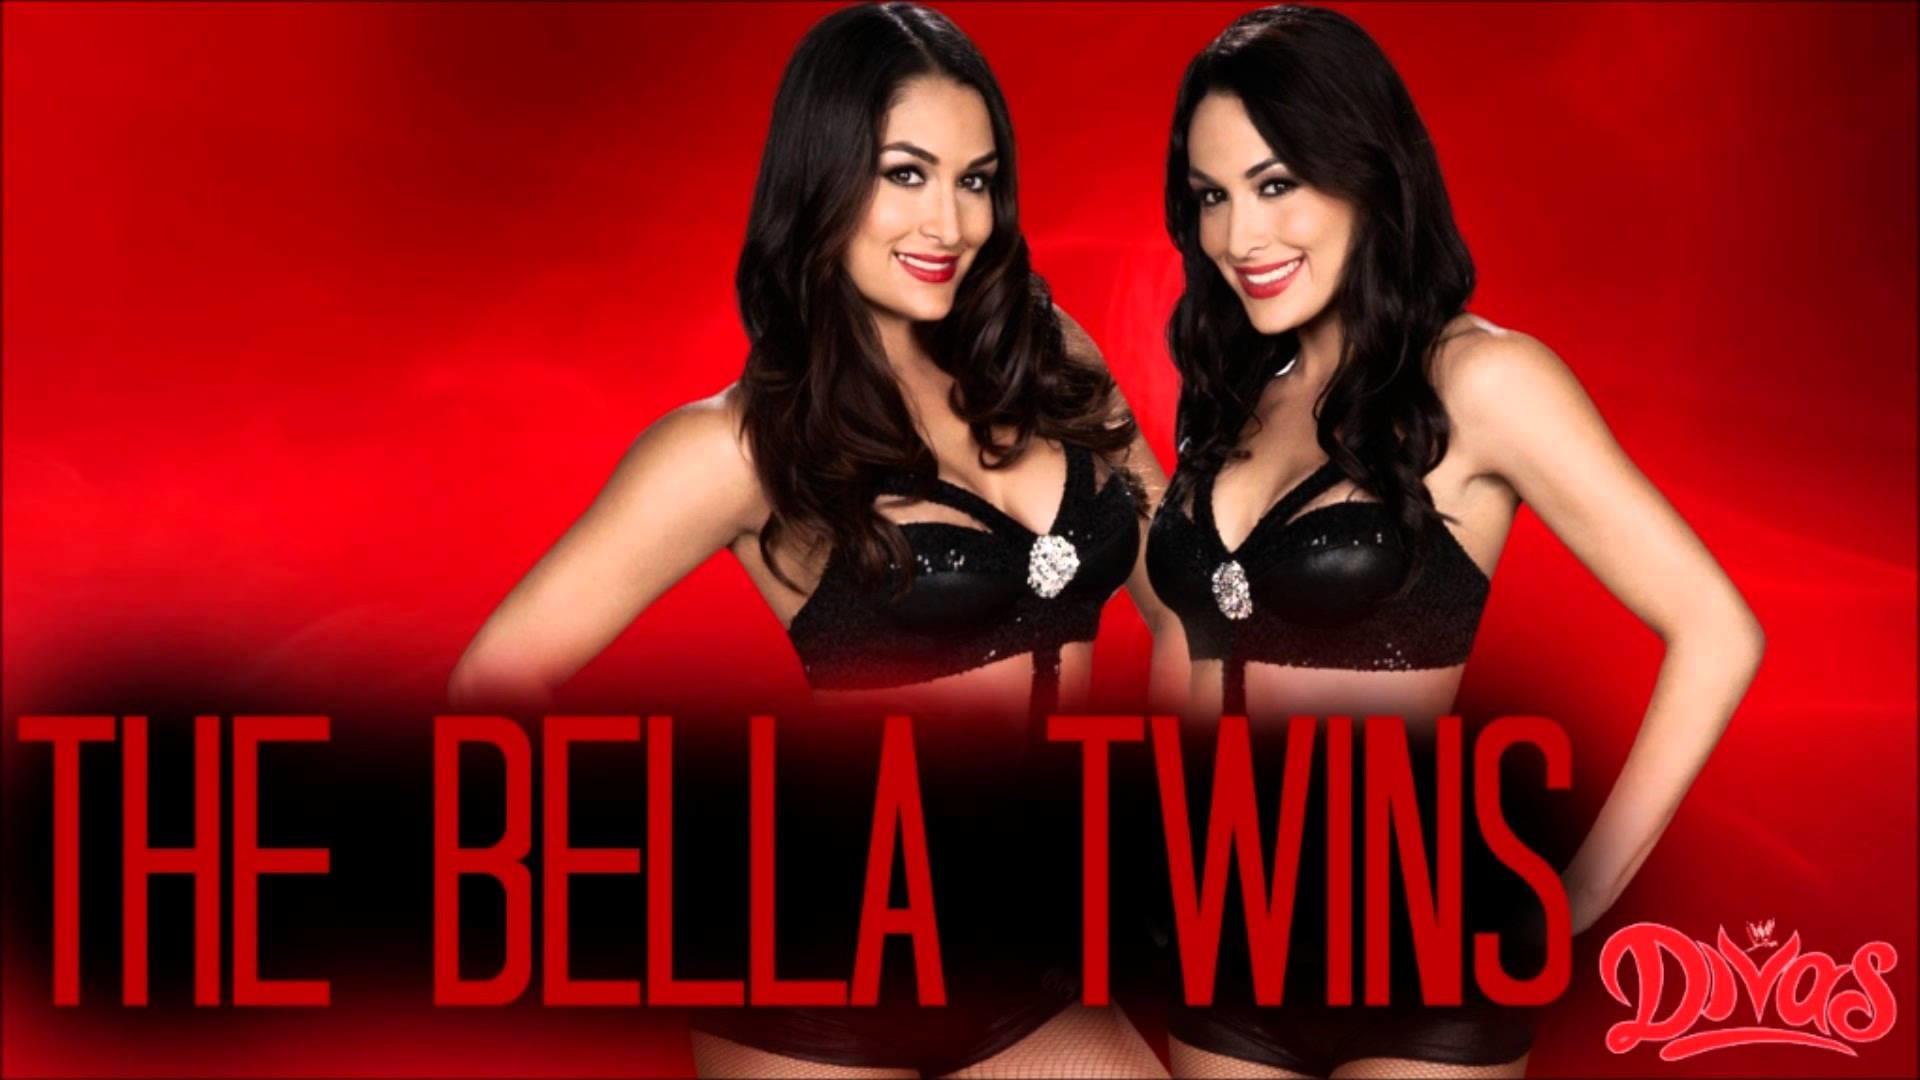 WWE: The Bella Twins –